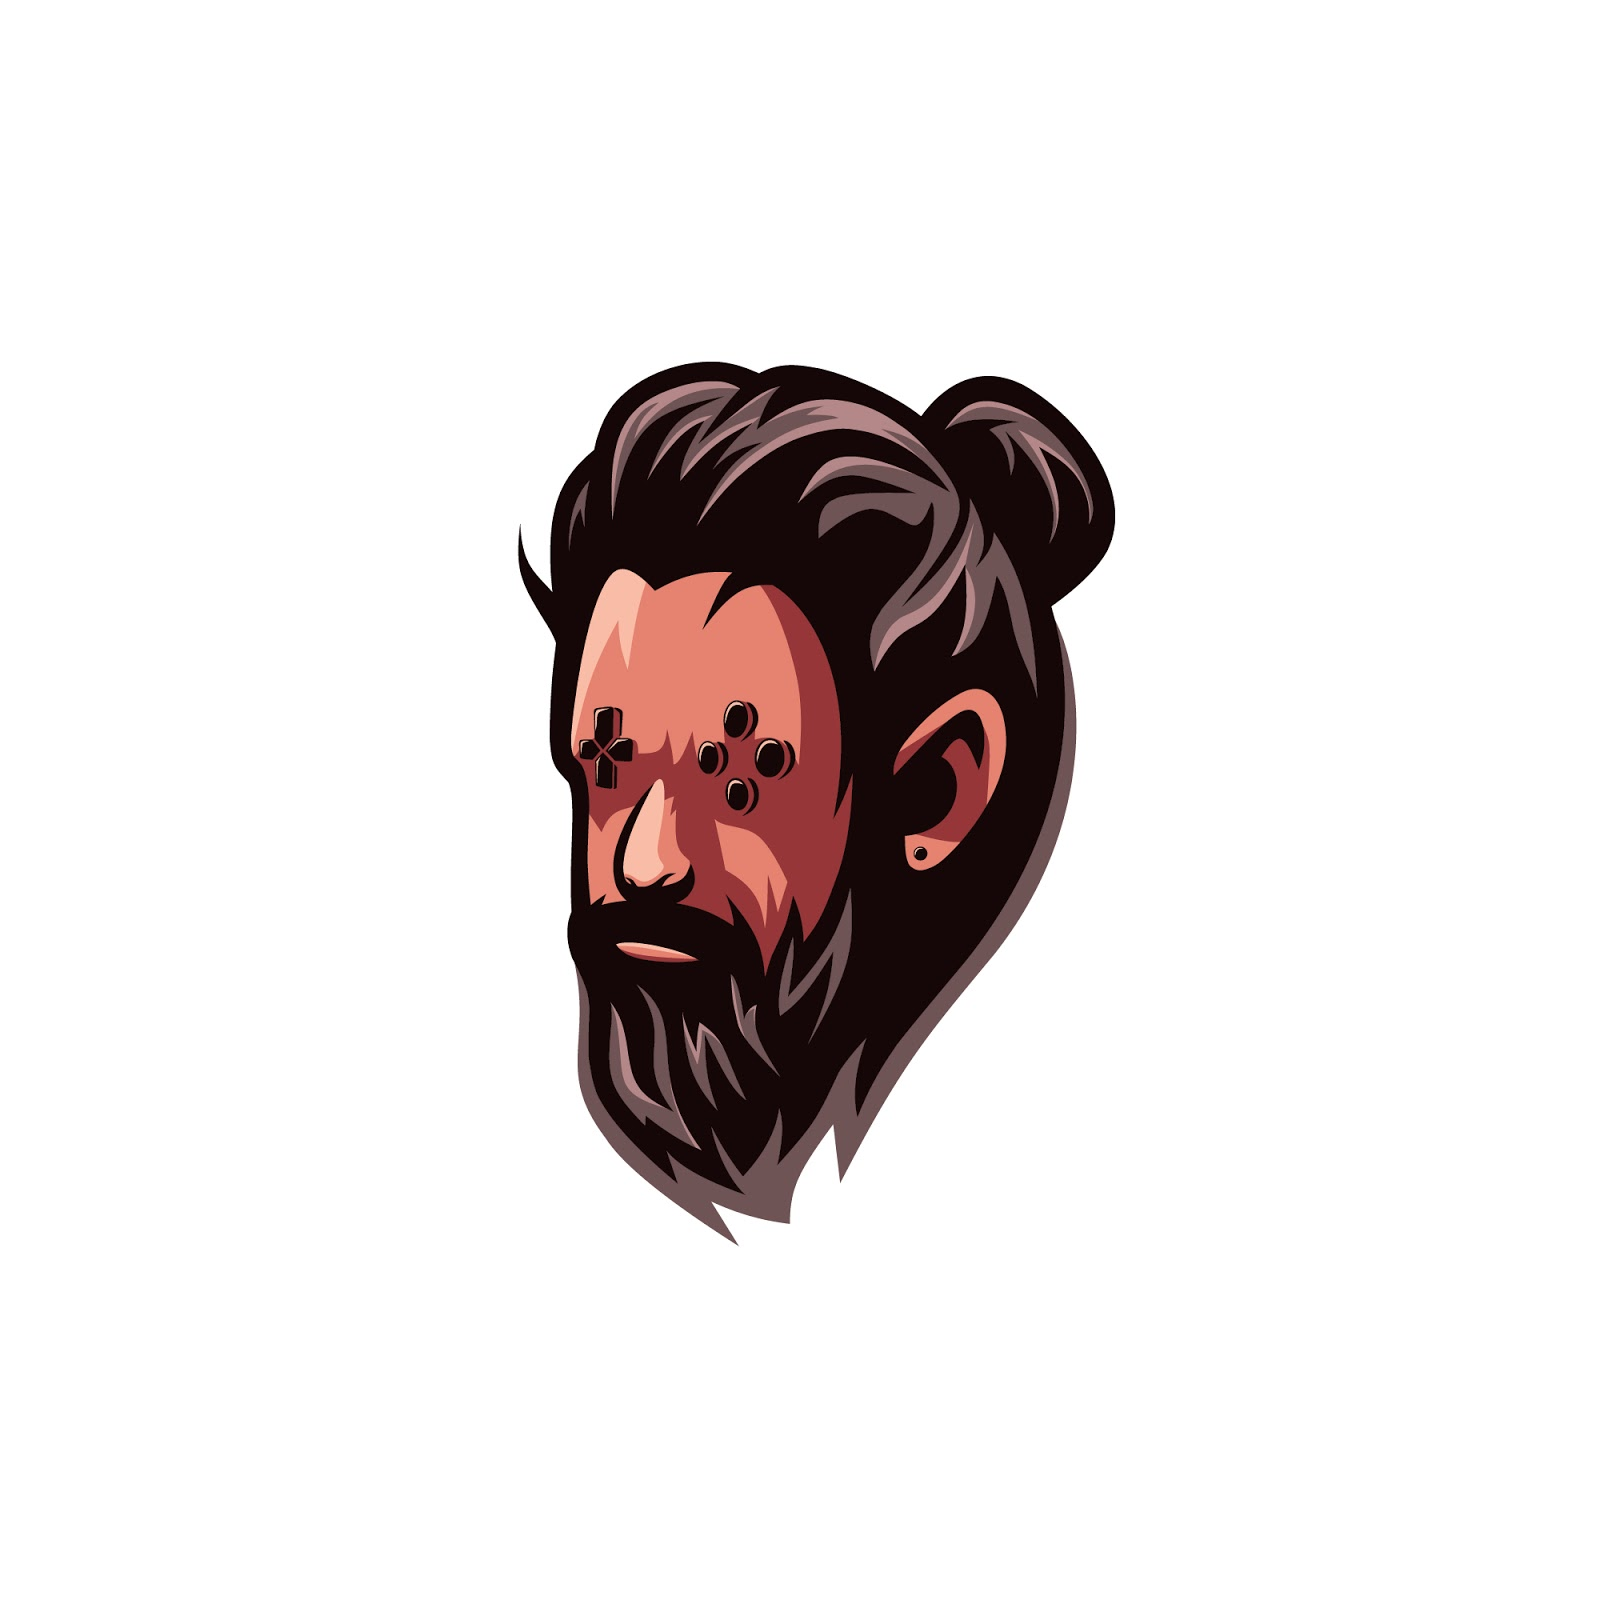 Beard Gaming Character Free Download Vector CDR, AI, EPS and PNG Formats